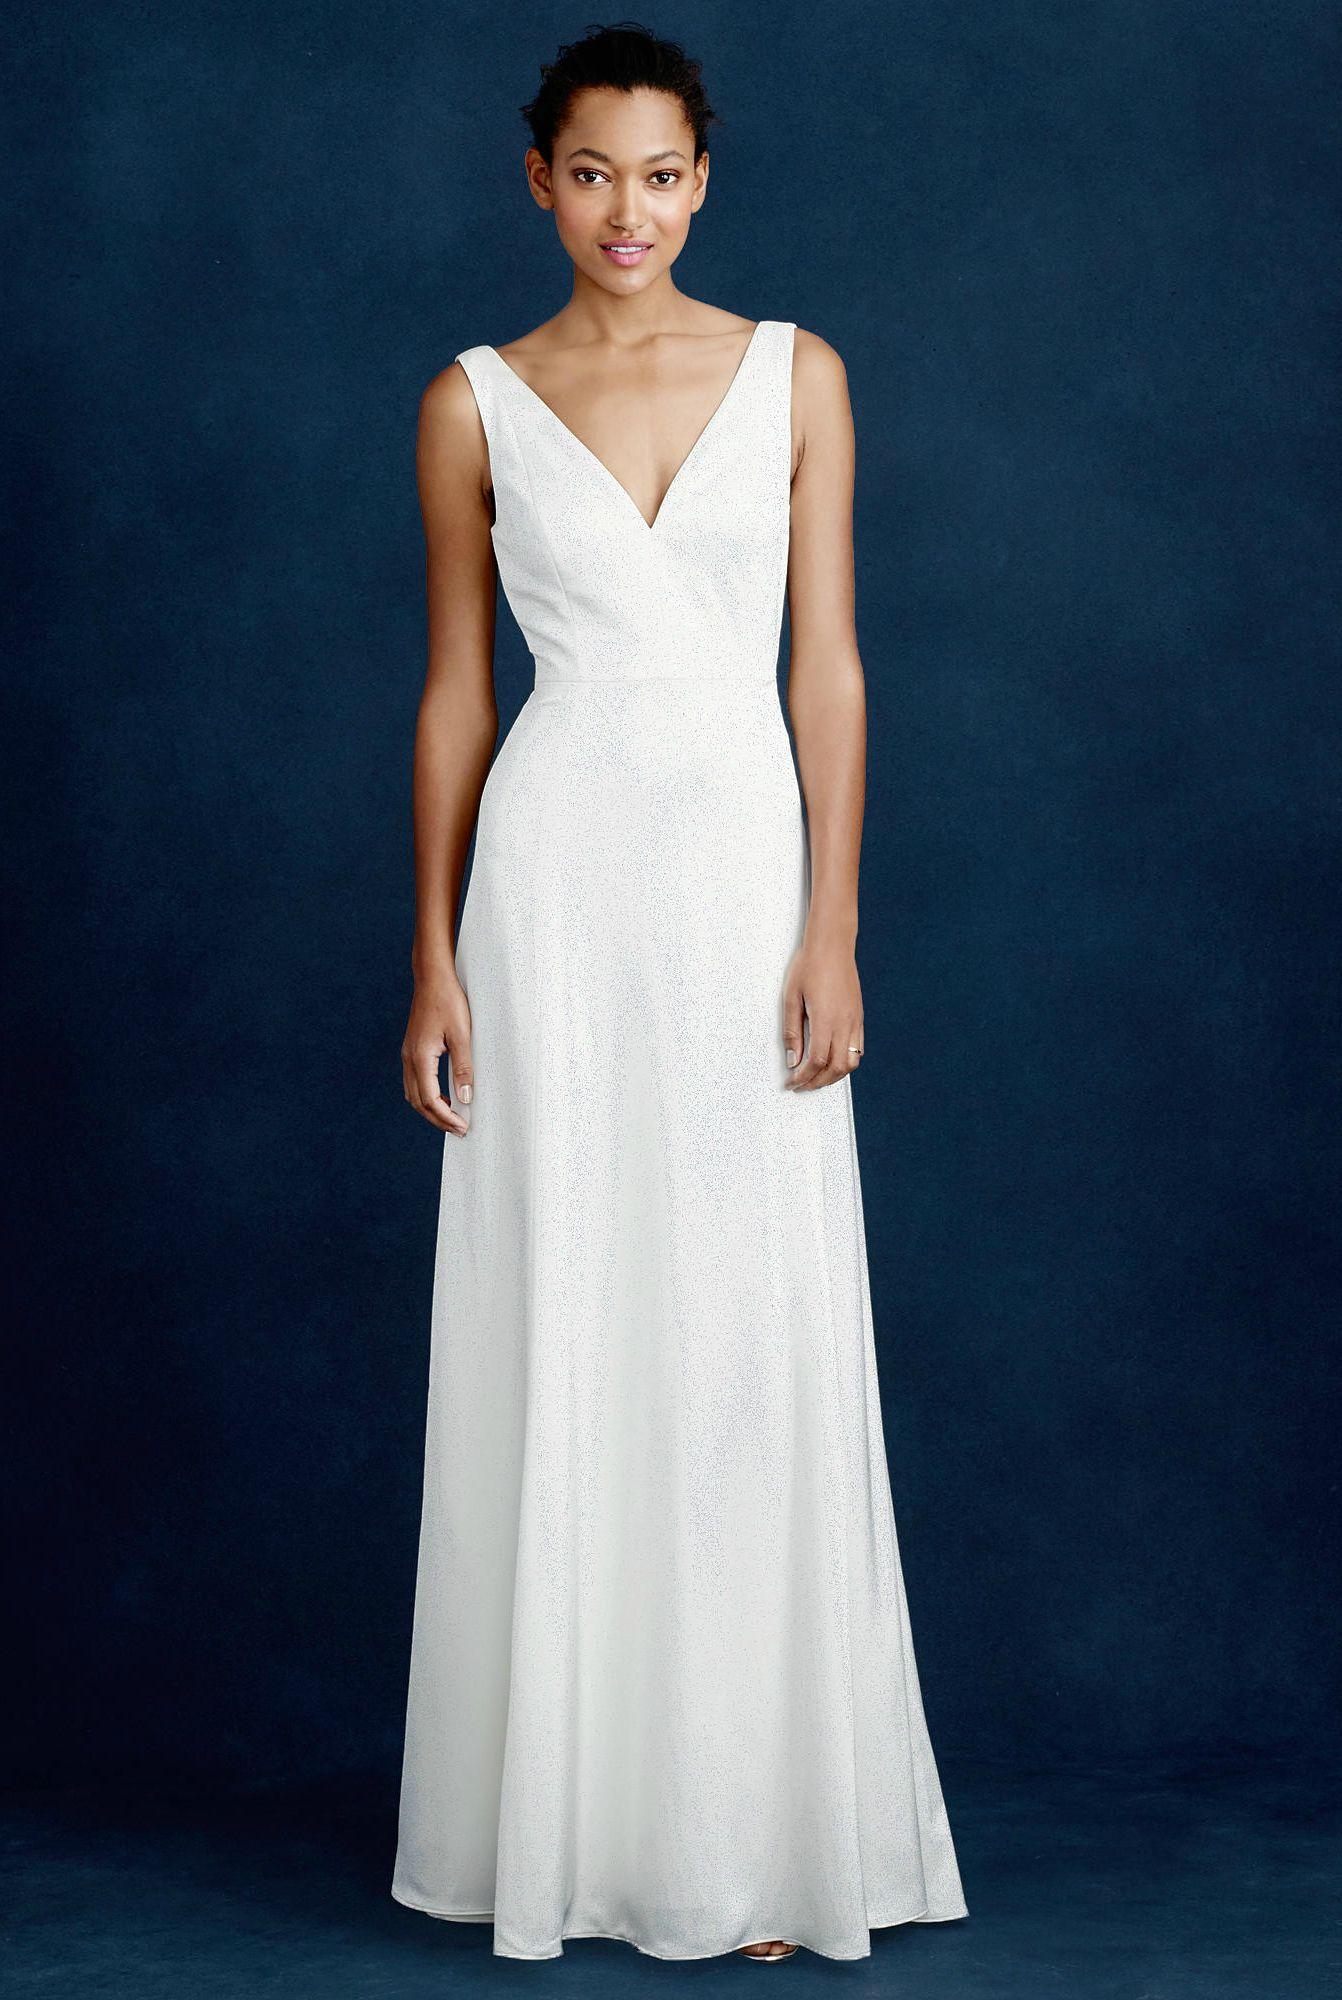 j.Crew #wedding dress \'Francoise\' Gown $550 + 25% off | Wedding ...